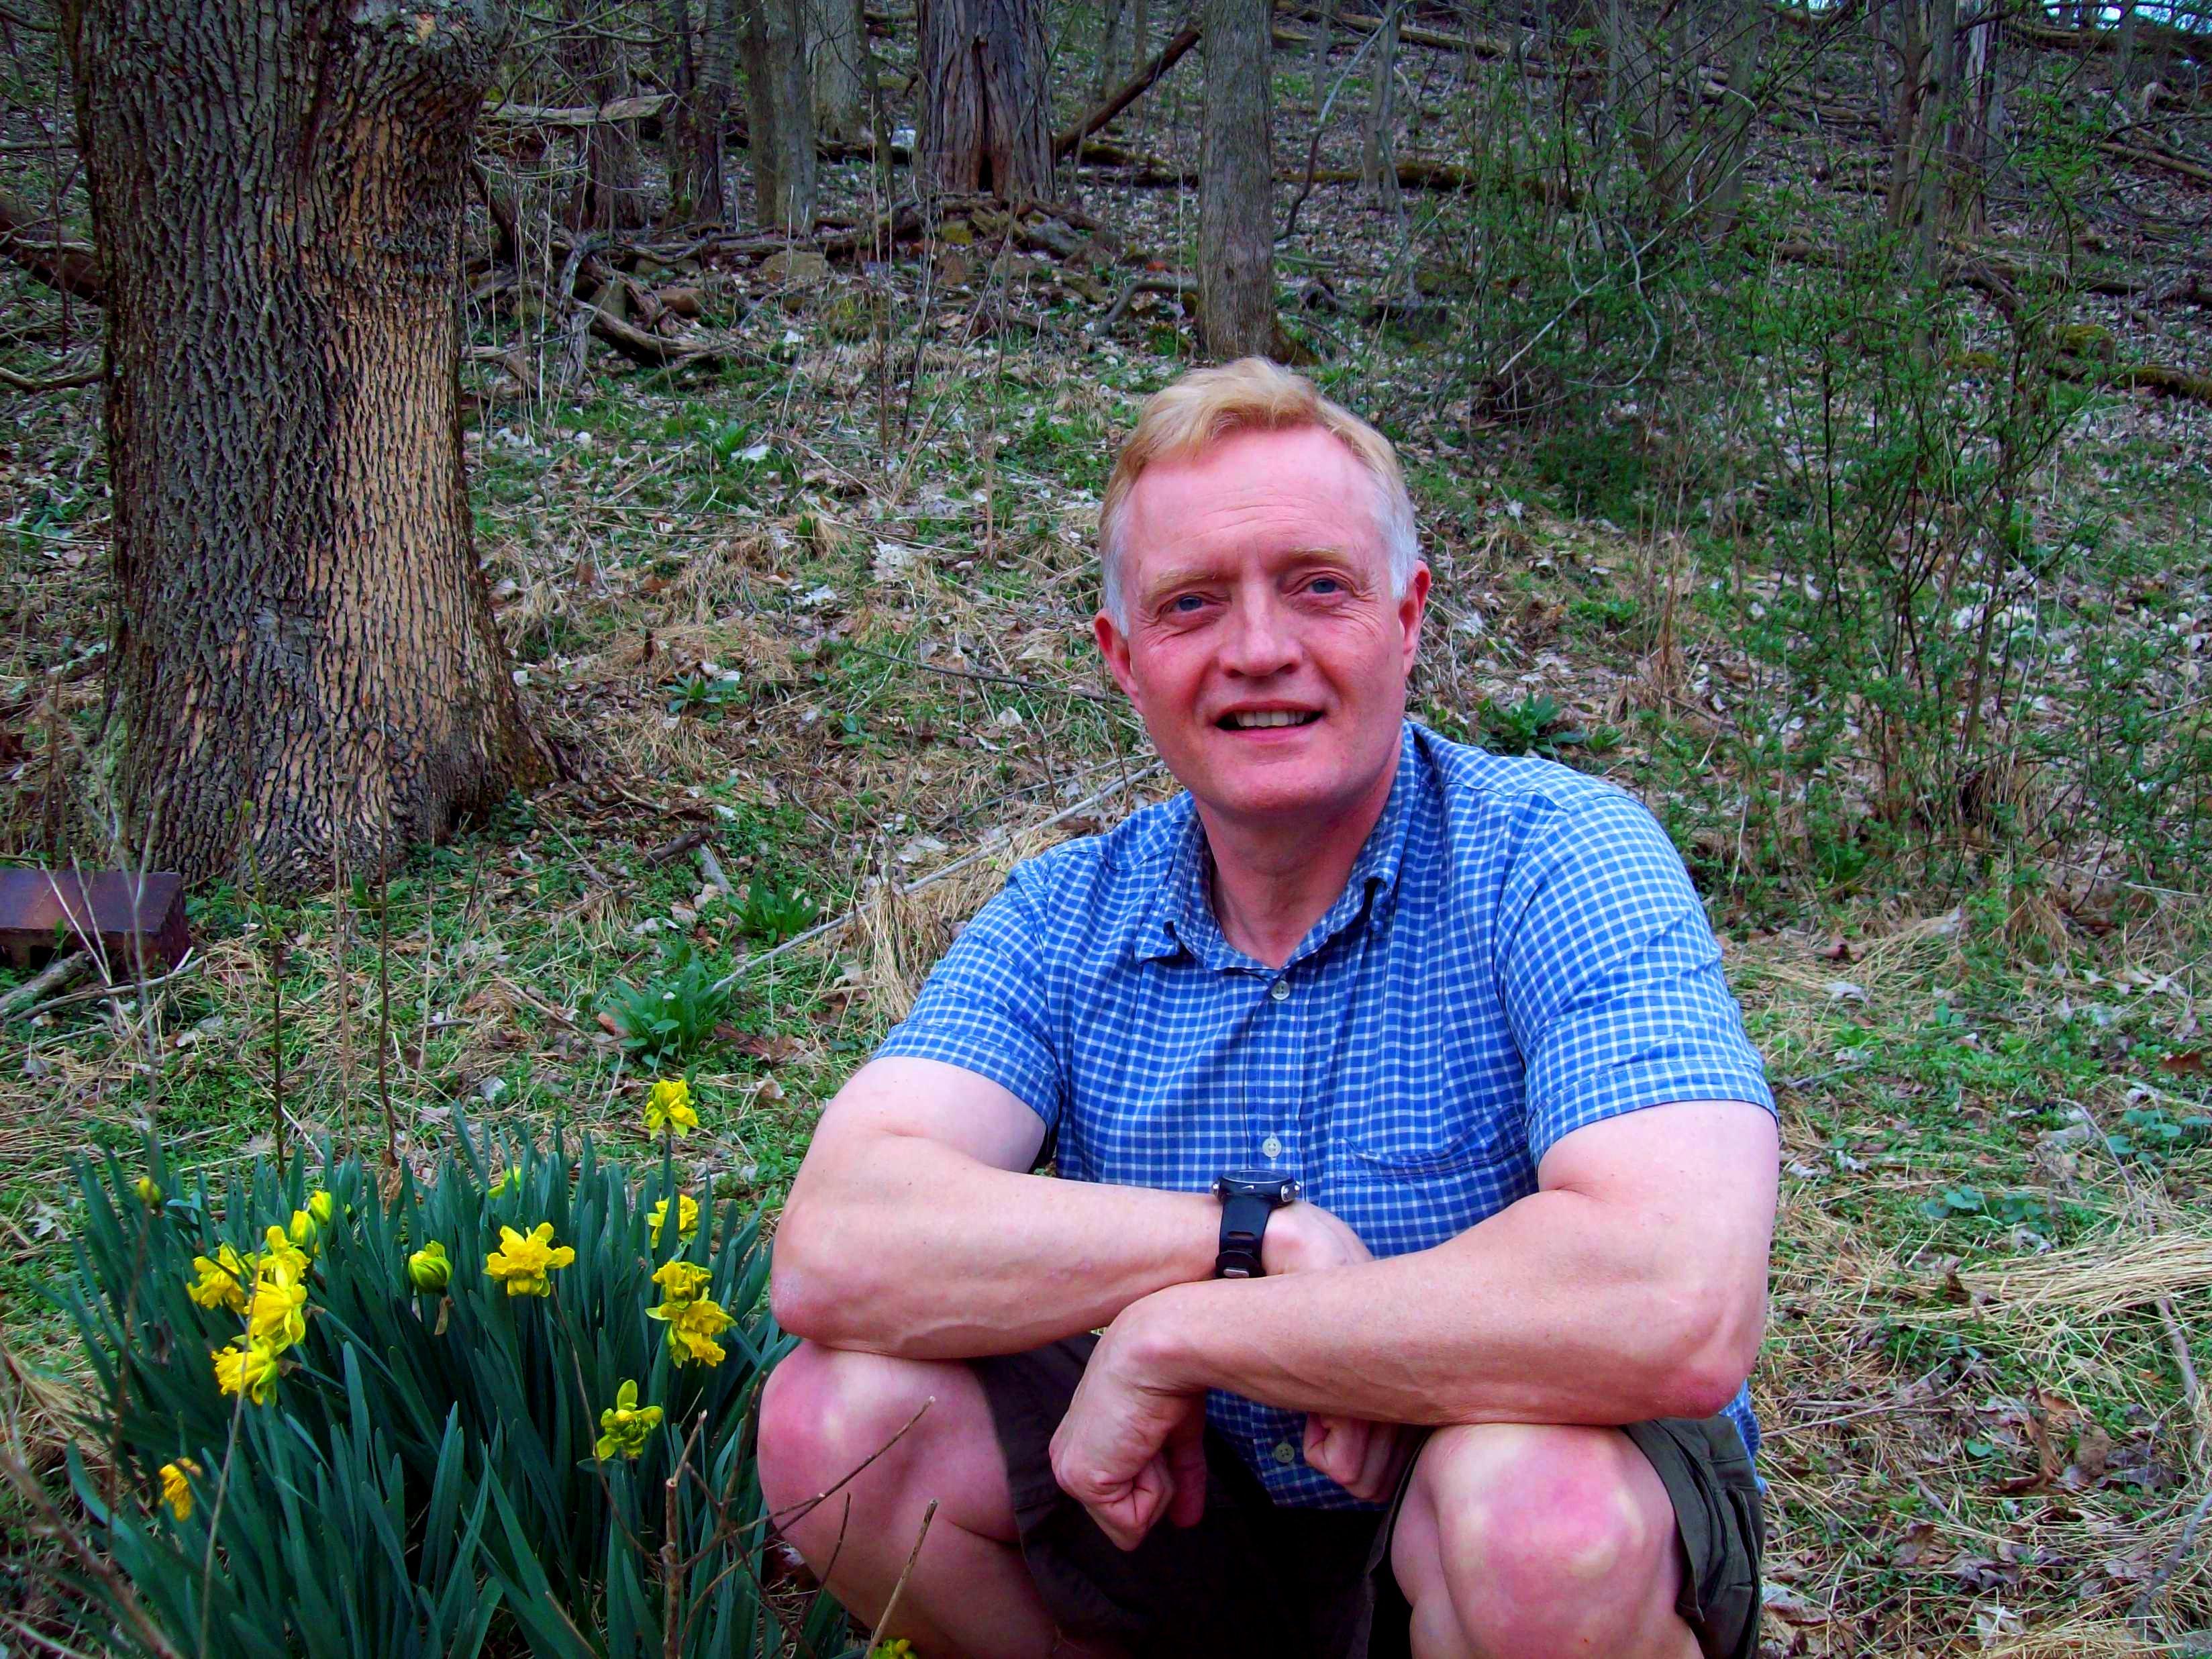 jdn-daffodils-681-canal-rd-april-2013